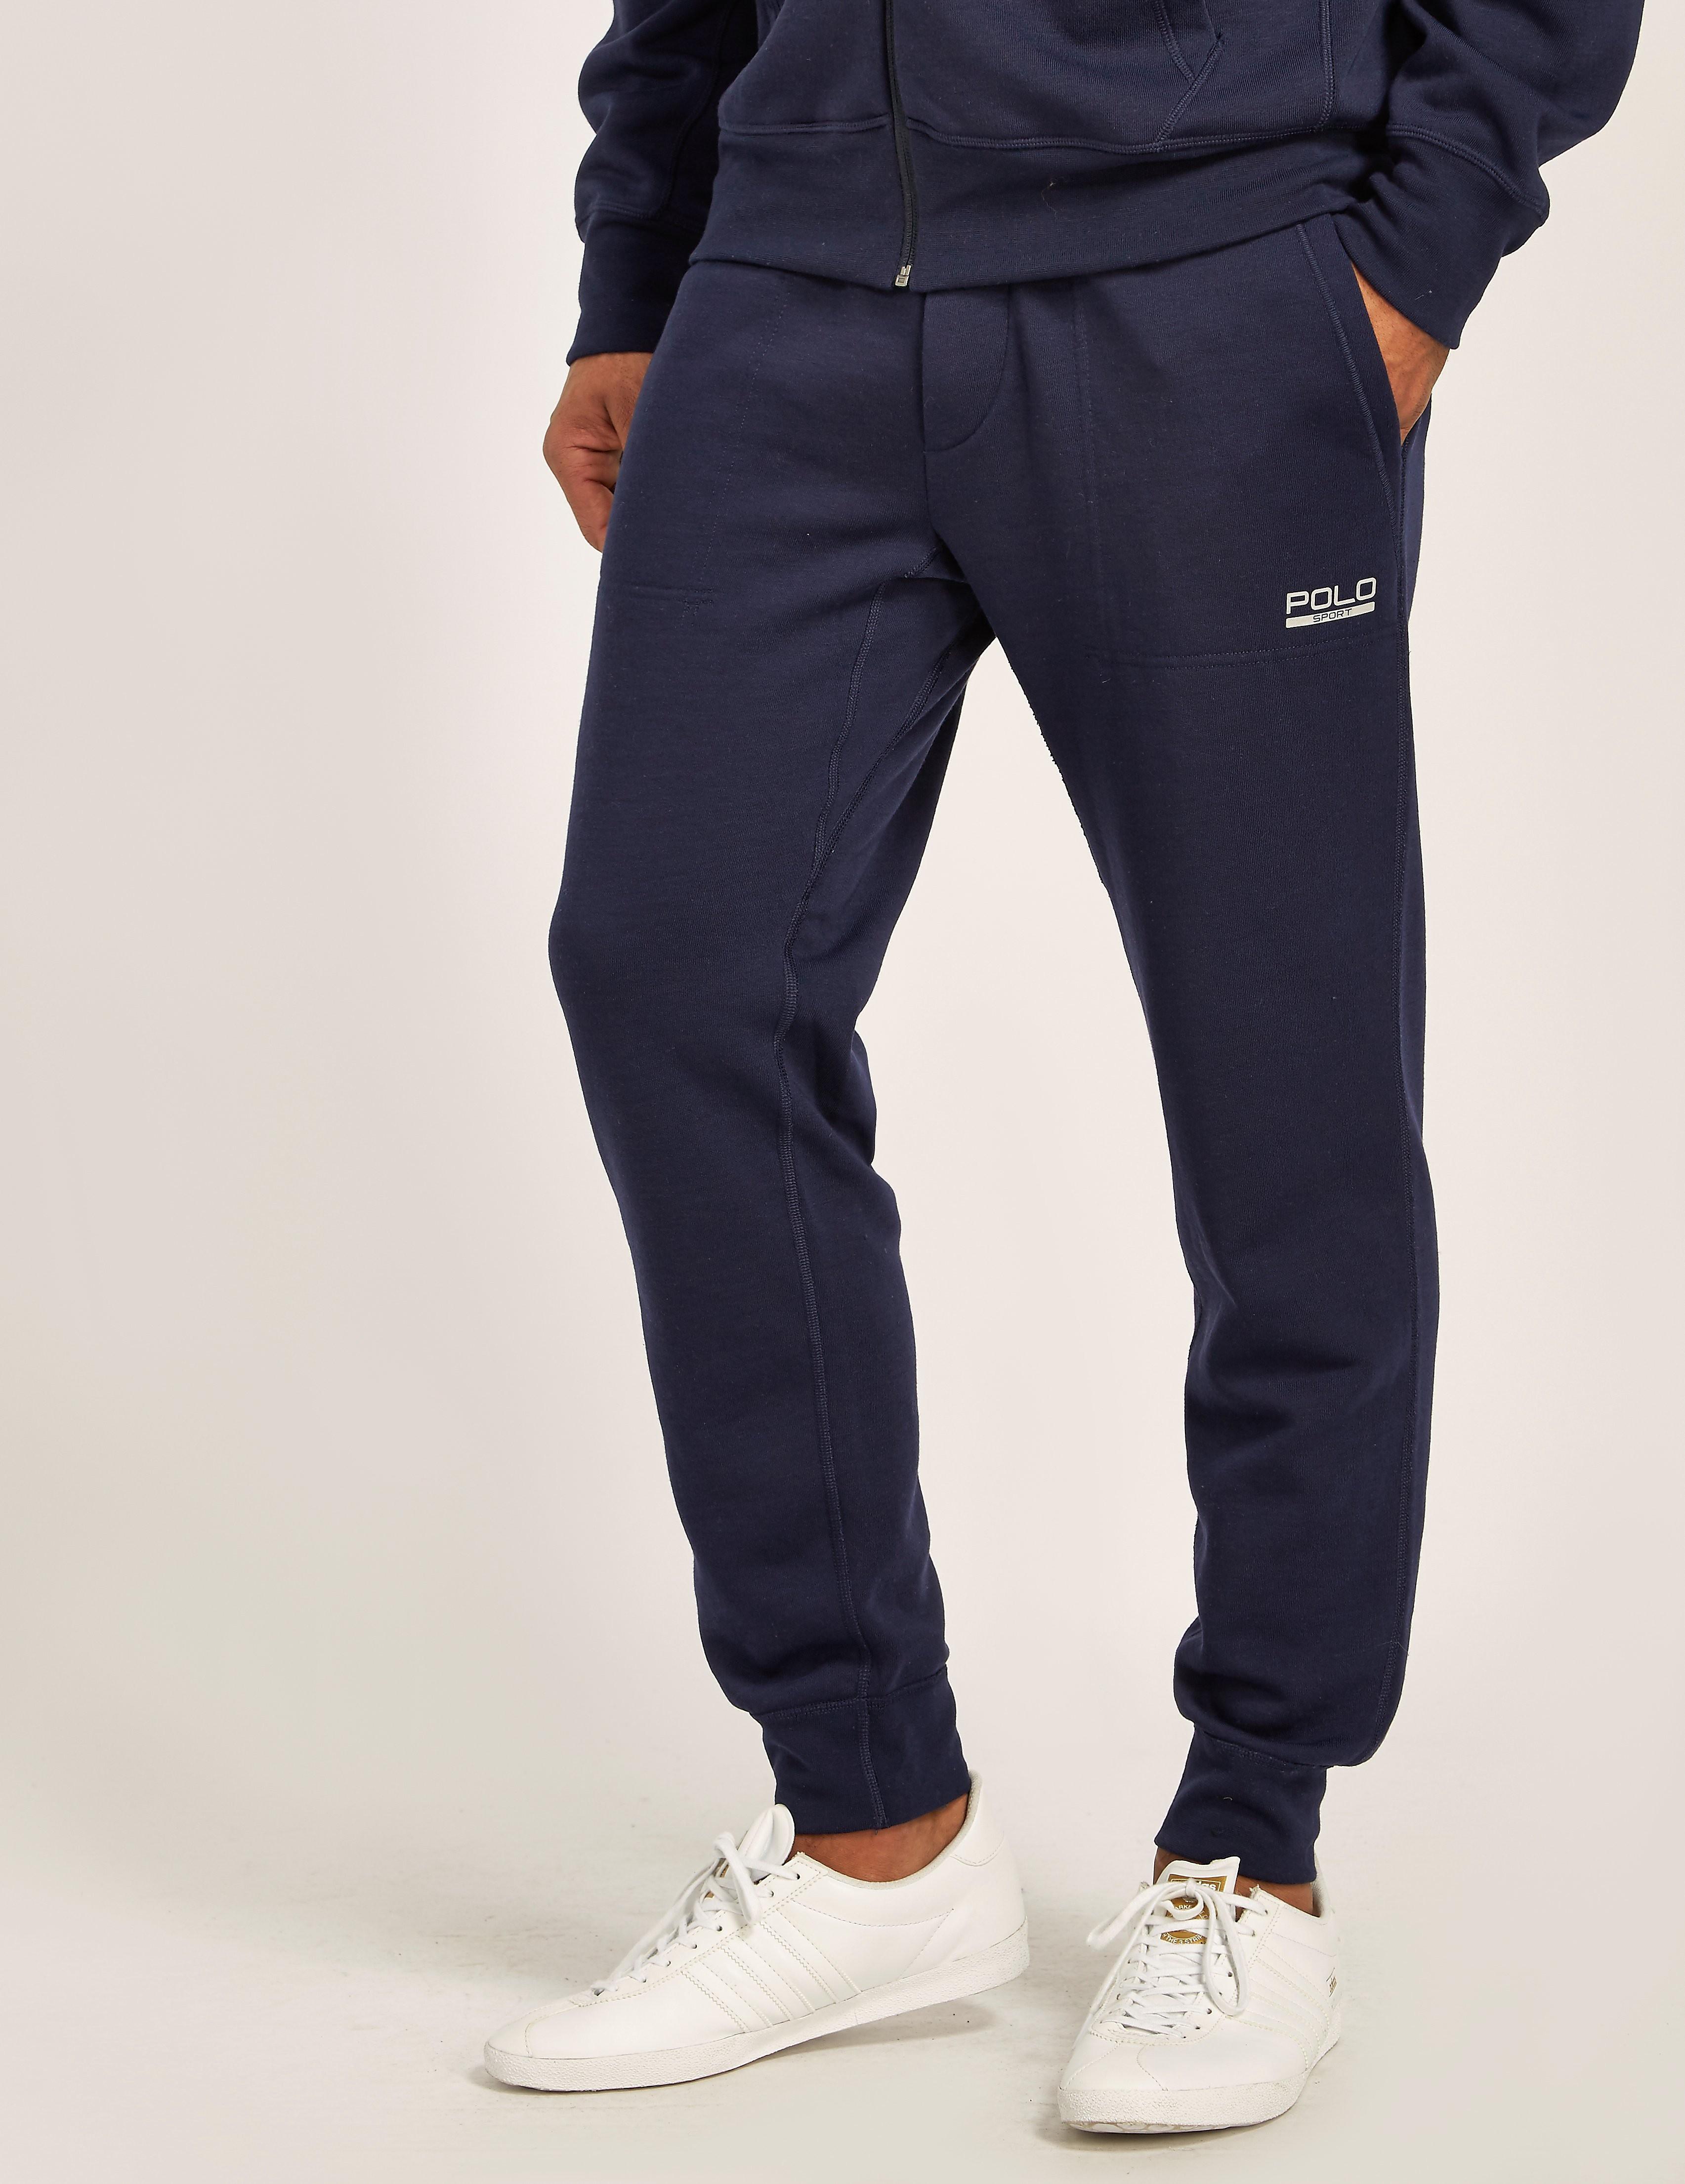 Polo Sport Neon Fleece Track Pants